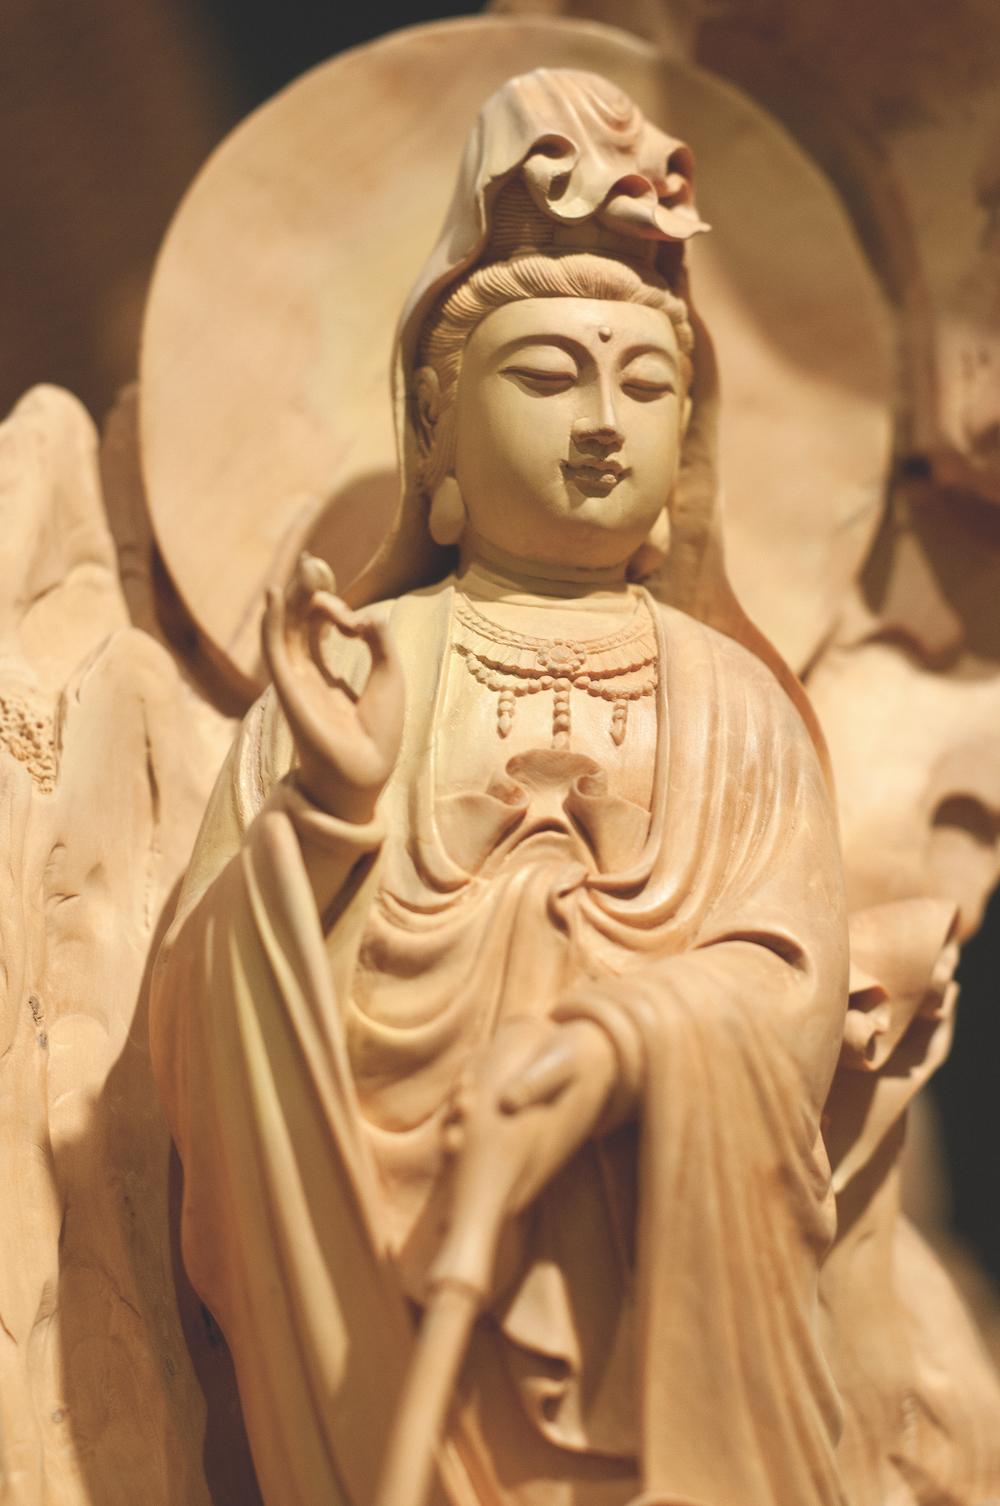 Bodhisattva2 small.jpg